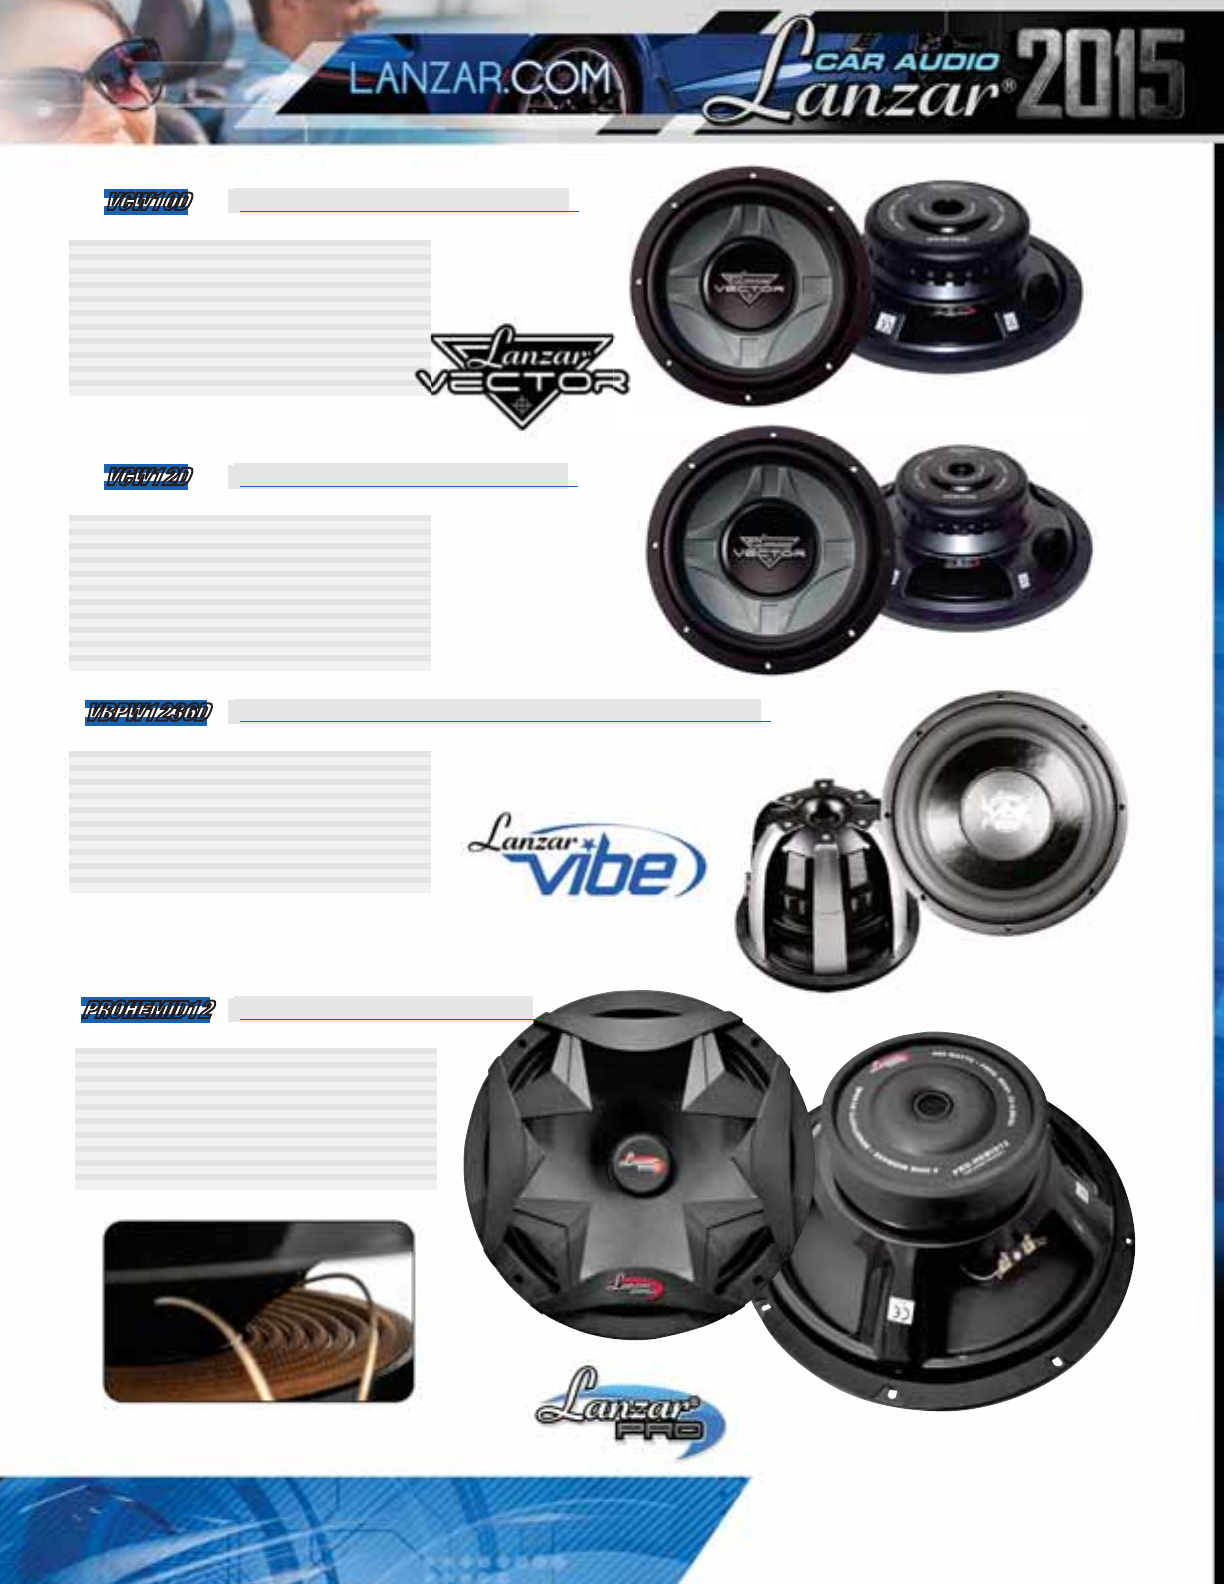 Lanzar 2015 With Bleed Vector Vc6k Lanzarr Ampkit4 4 Gauge Contaq Amplifier Wiring Kit 37